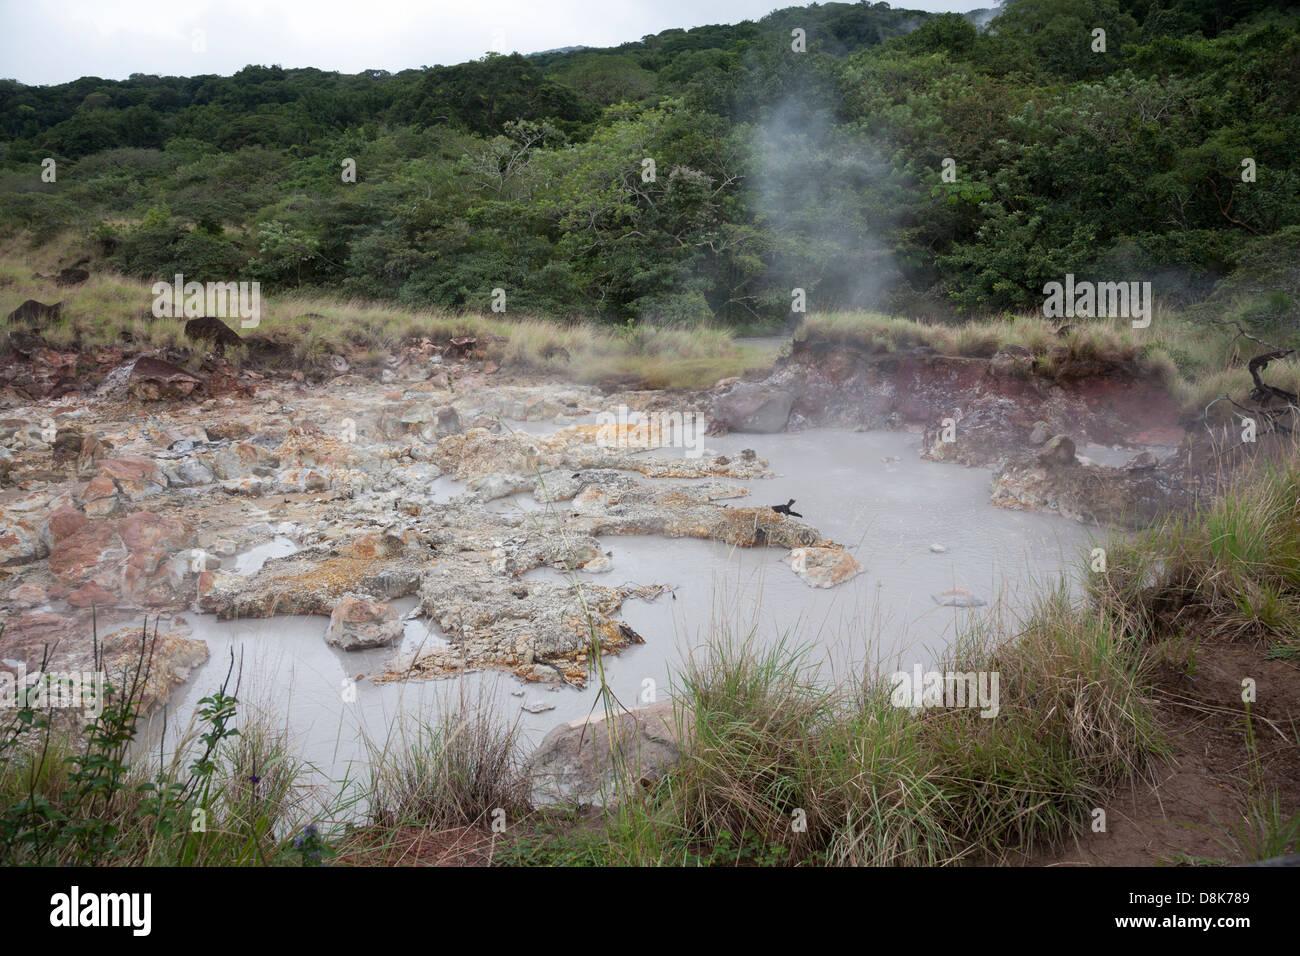 Fumaroles, boiling water and steam, Rincon de la Vieja National Park, Costa Rica - Stock Image